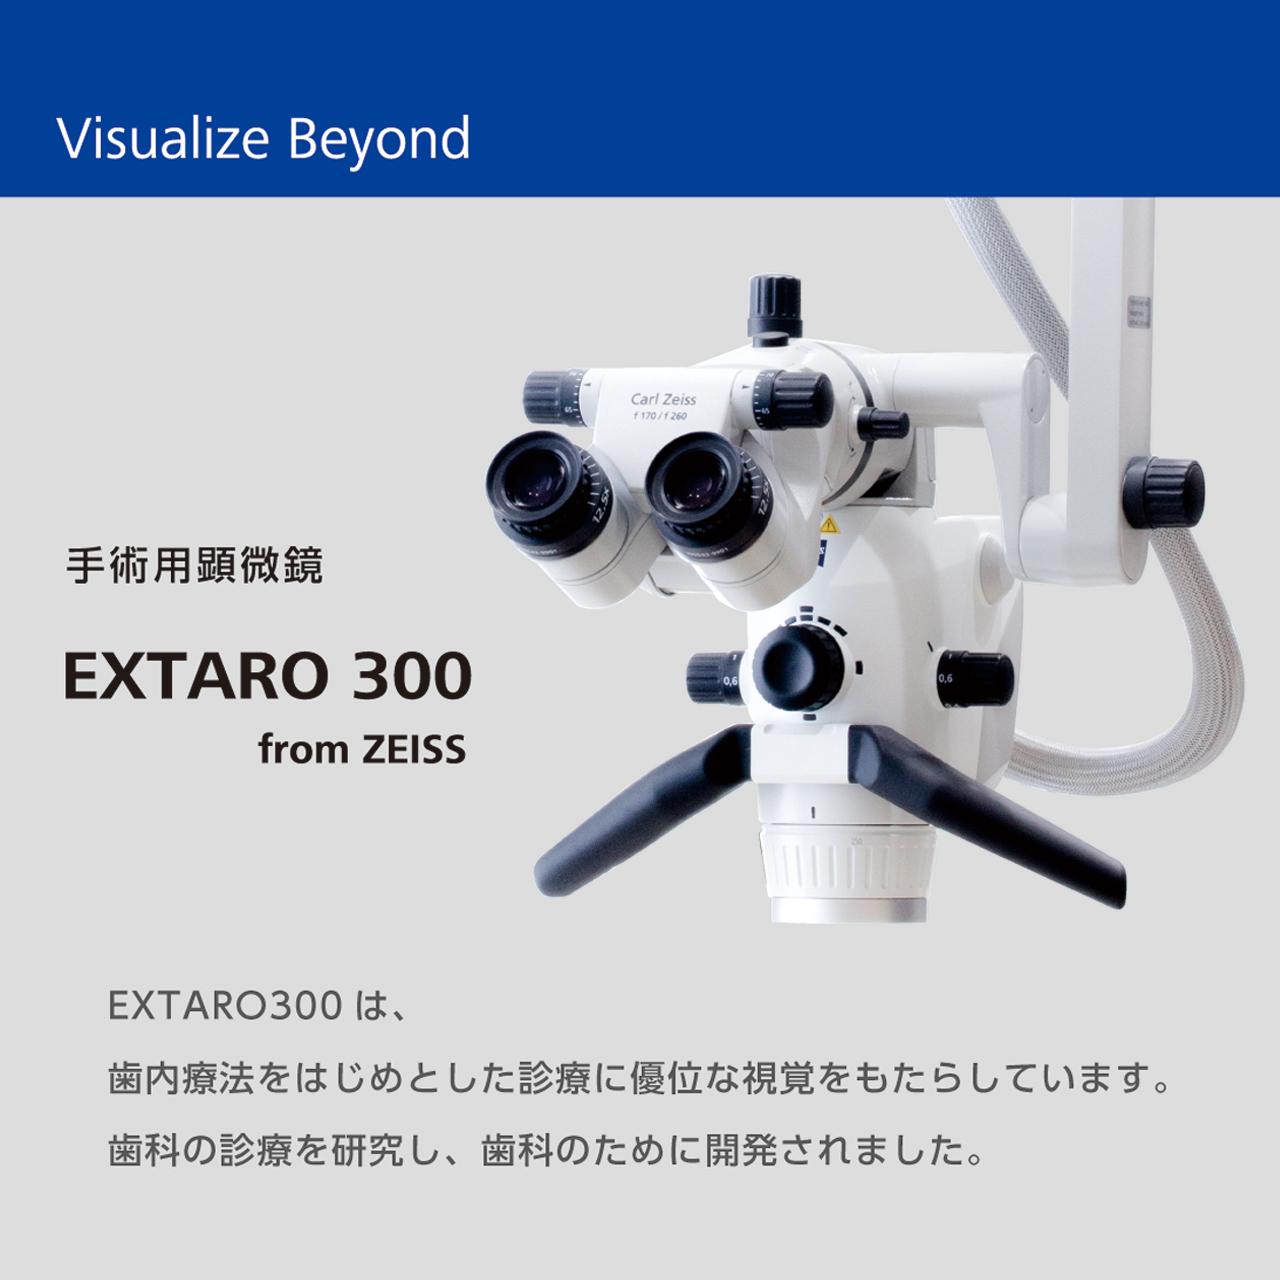 EXTARO 300